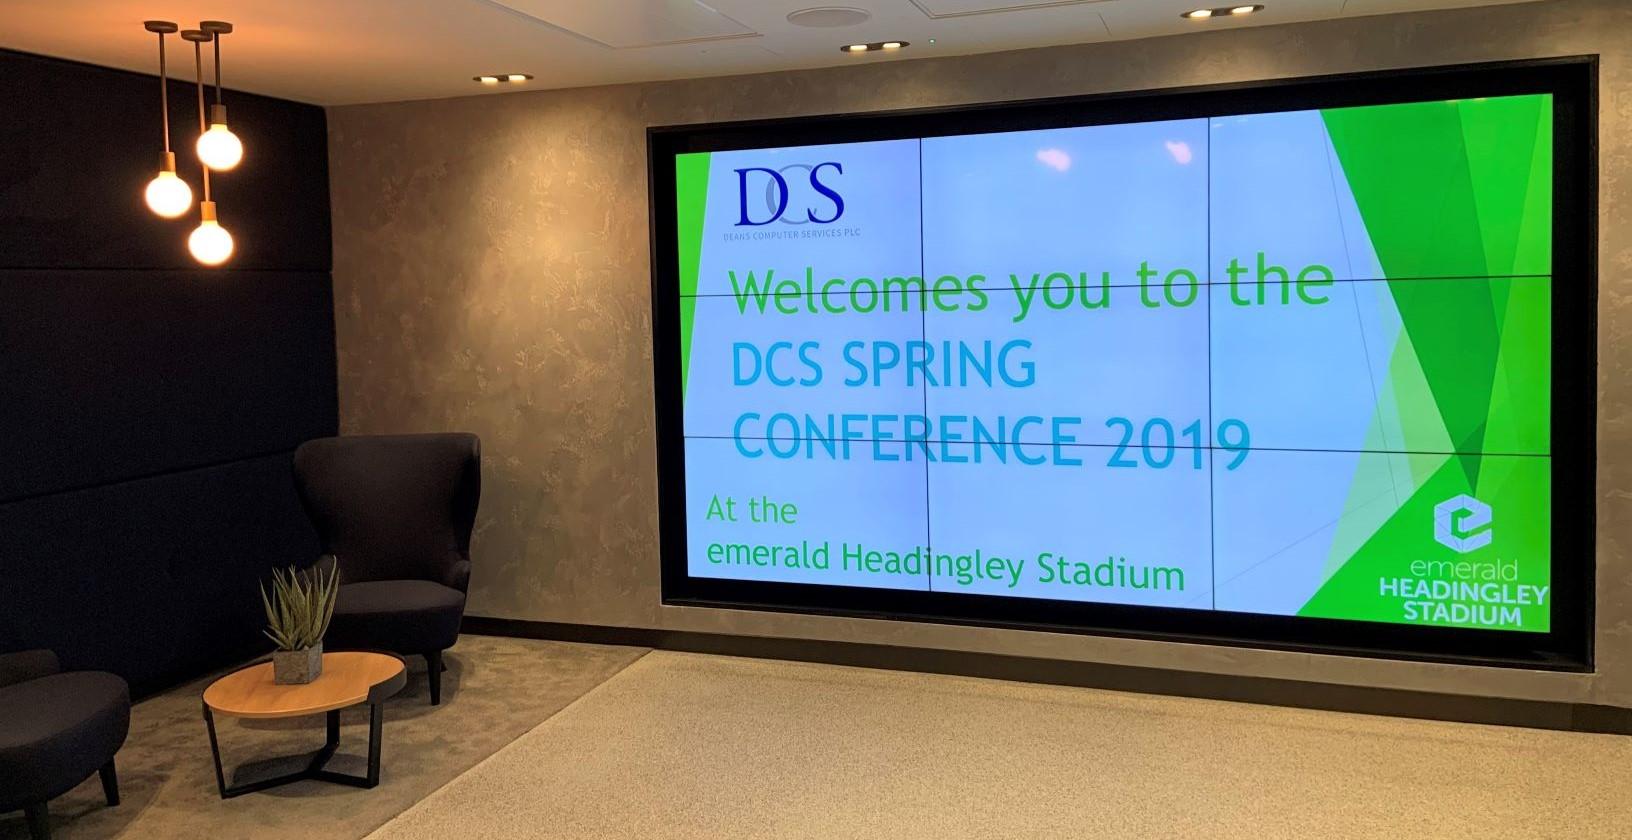 DCS Spring Conference 2019, emerald Headingley Stadium